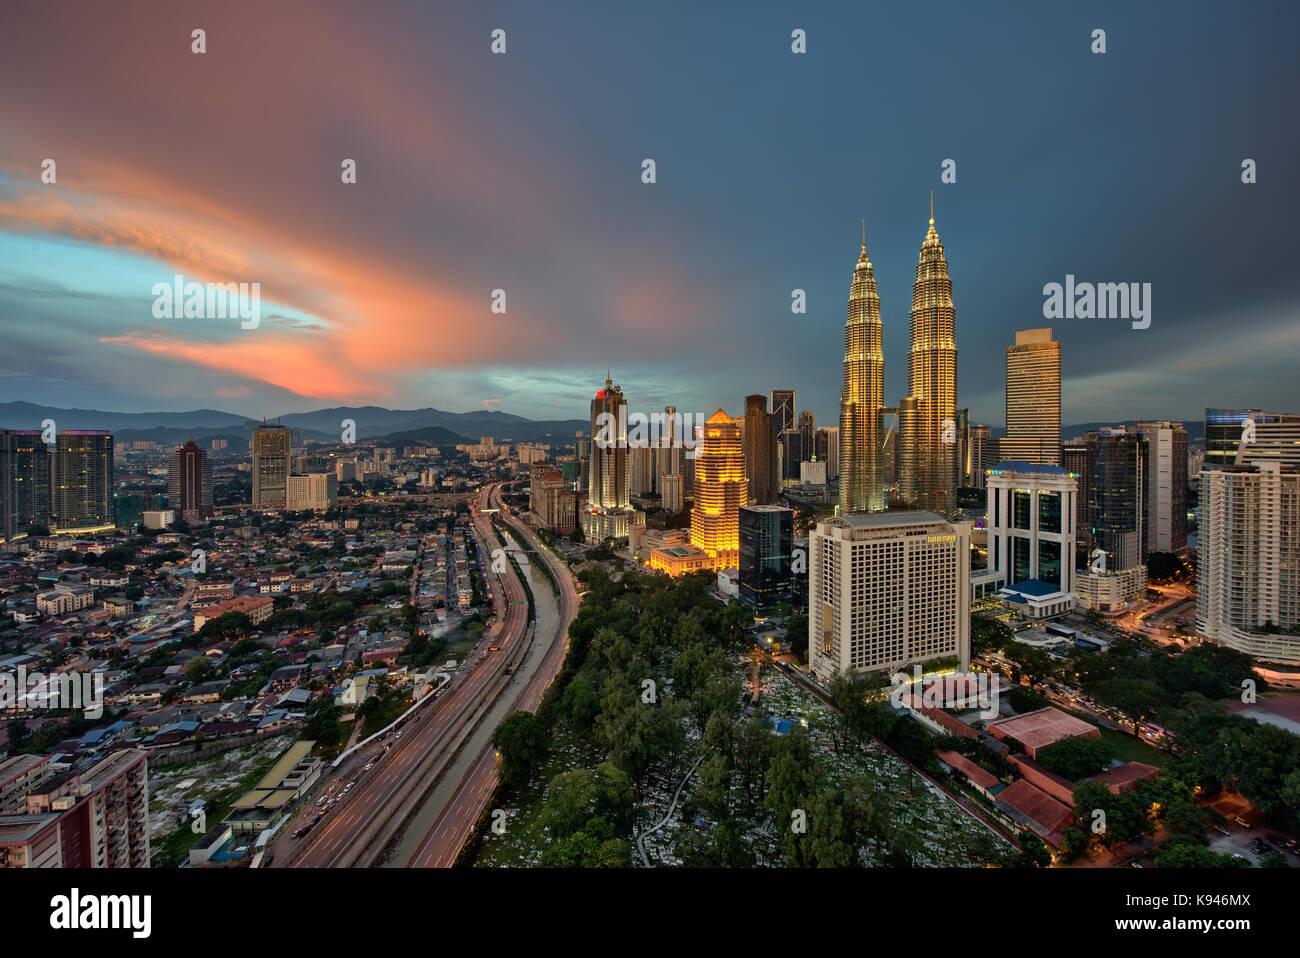 Paisaje urbano de Kuala Lumpur, Malasia, al atardecer, con torres Petronas iluminada en la distancia. Foto de stock